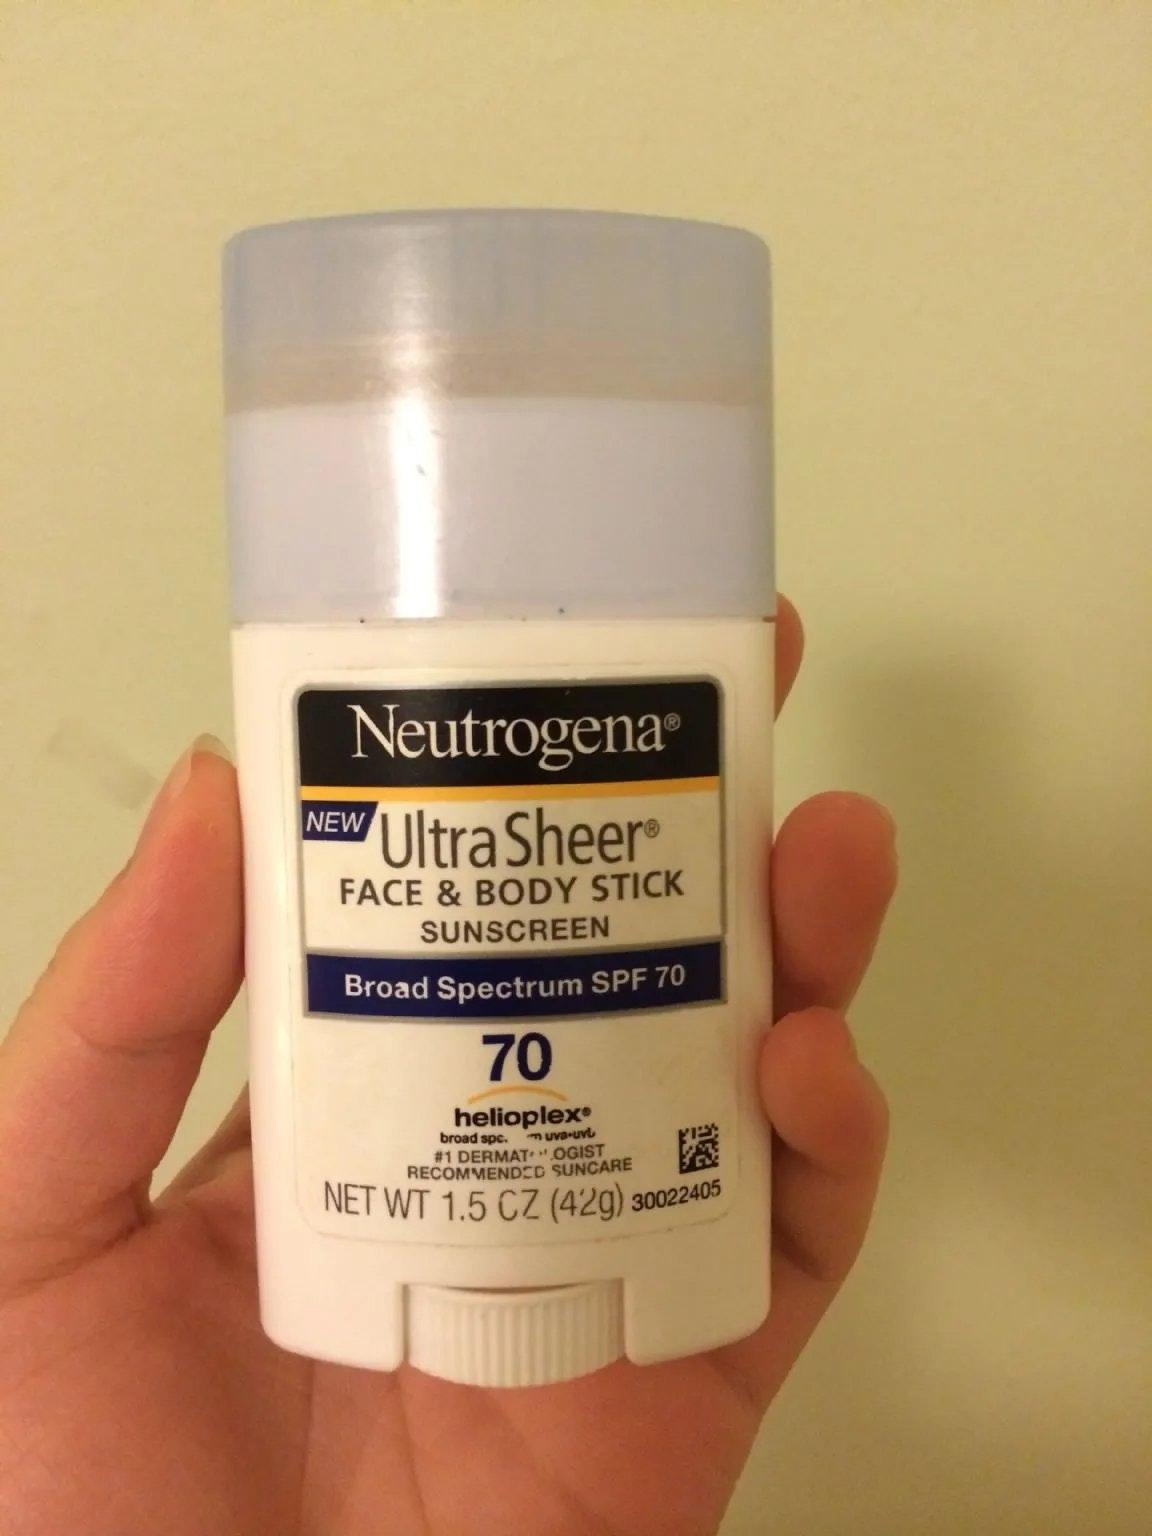 Neutrogena Face and Body Stick Sunscreen